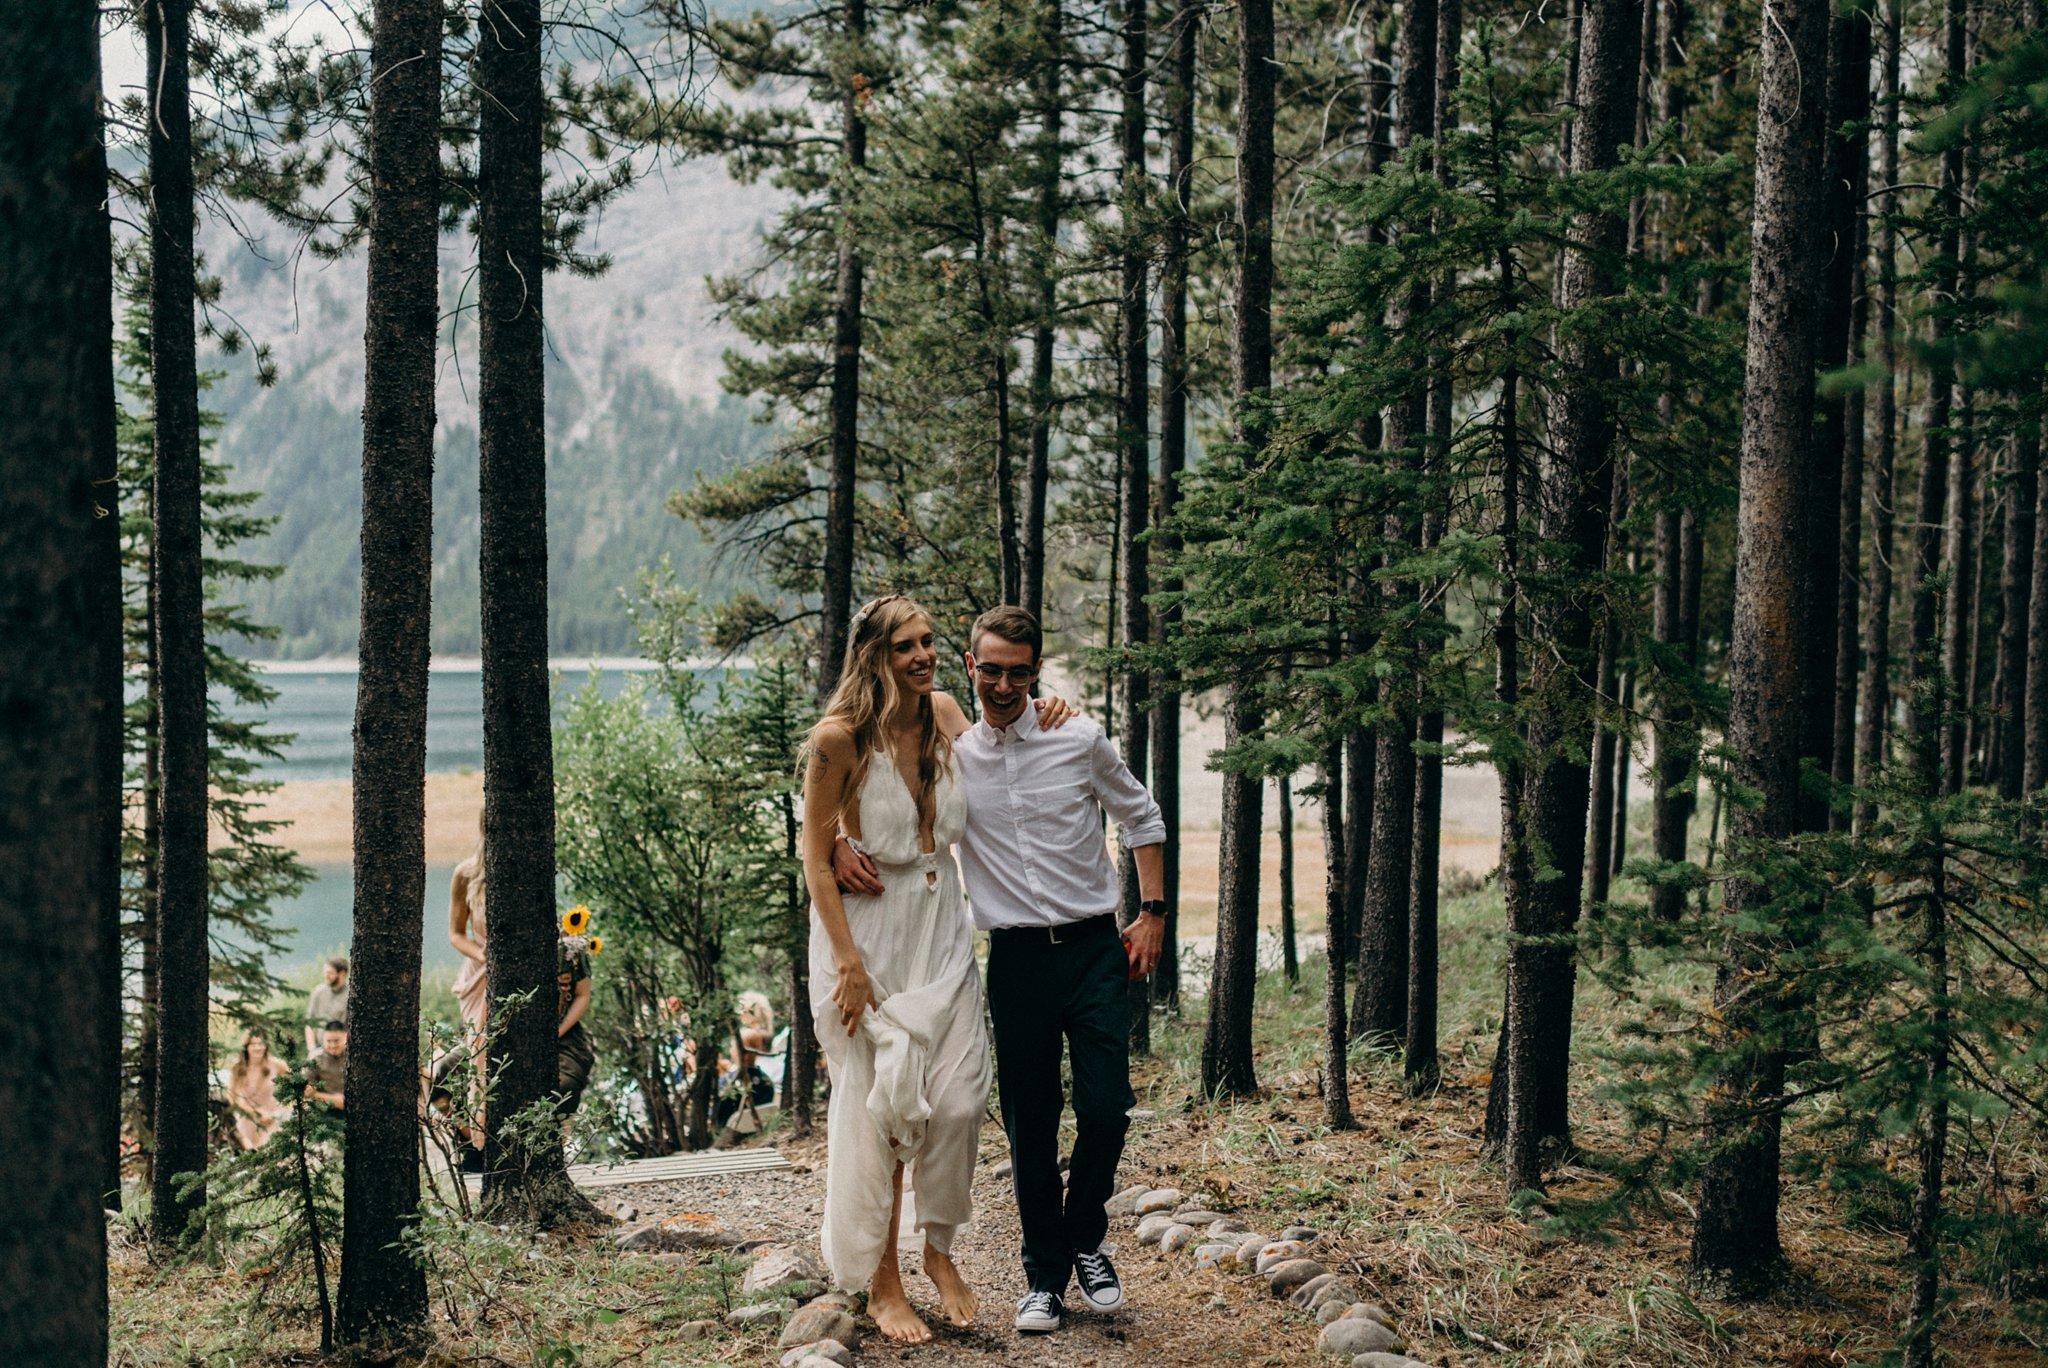 kaihla_tonai_intimate_wedding_elopement_photographer_6382.jpg